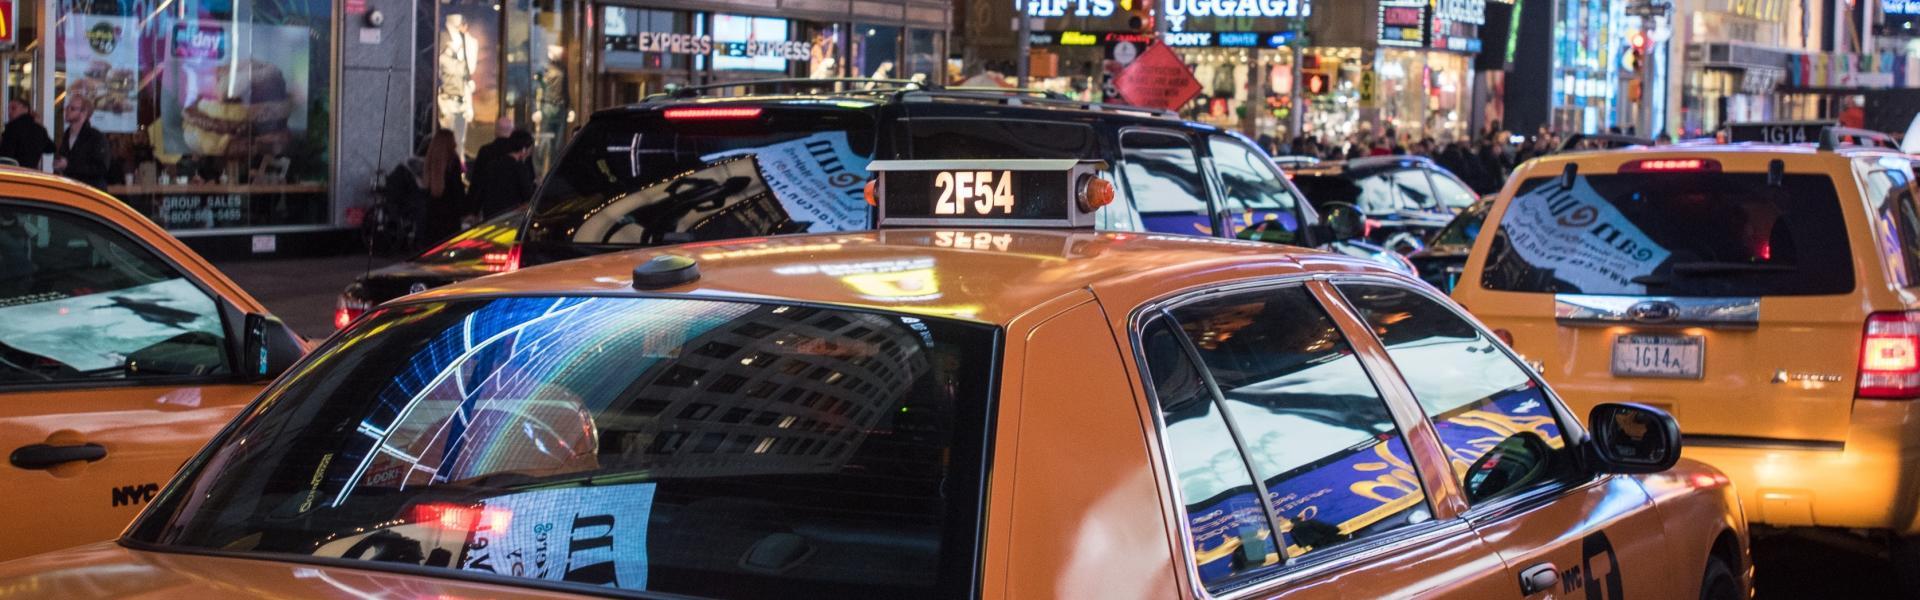 Taxi, Times Square, Midtown, Manhattan